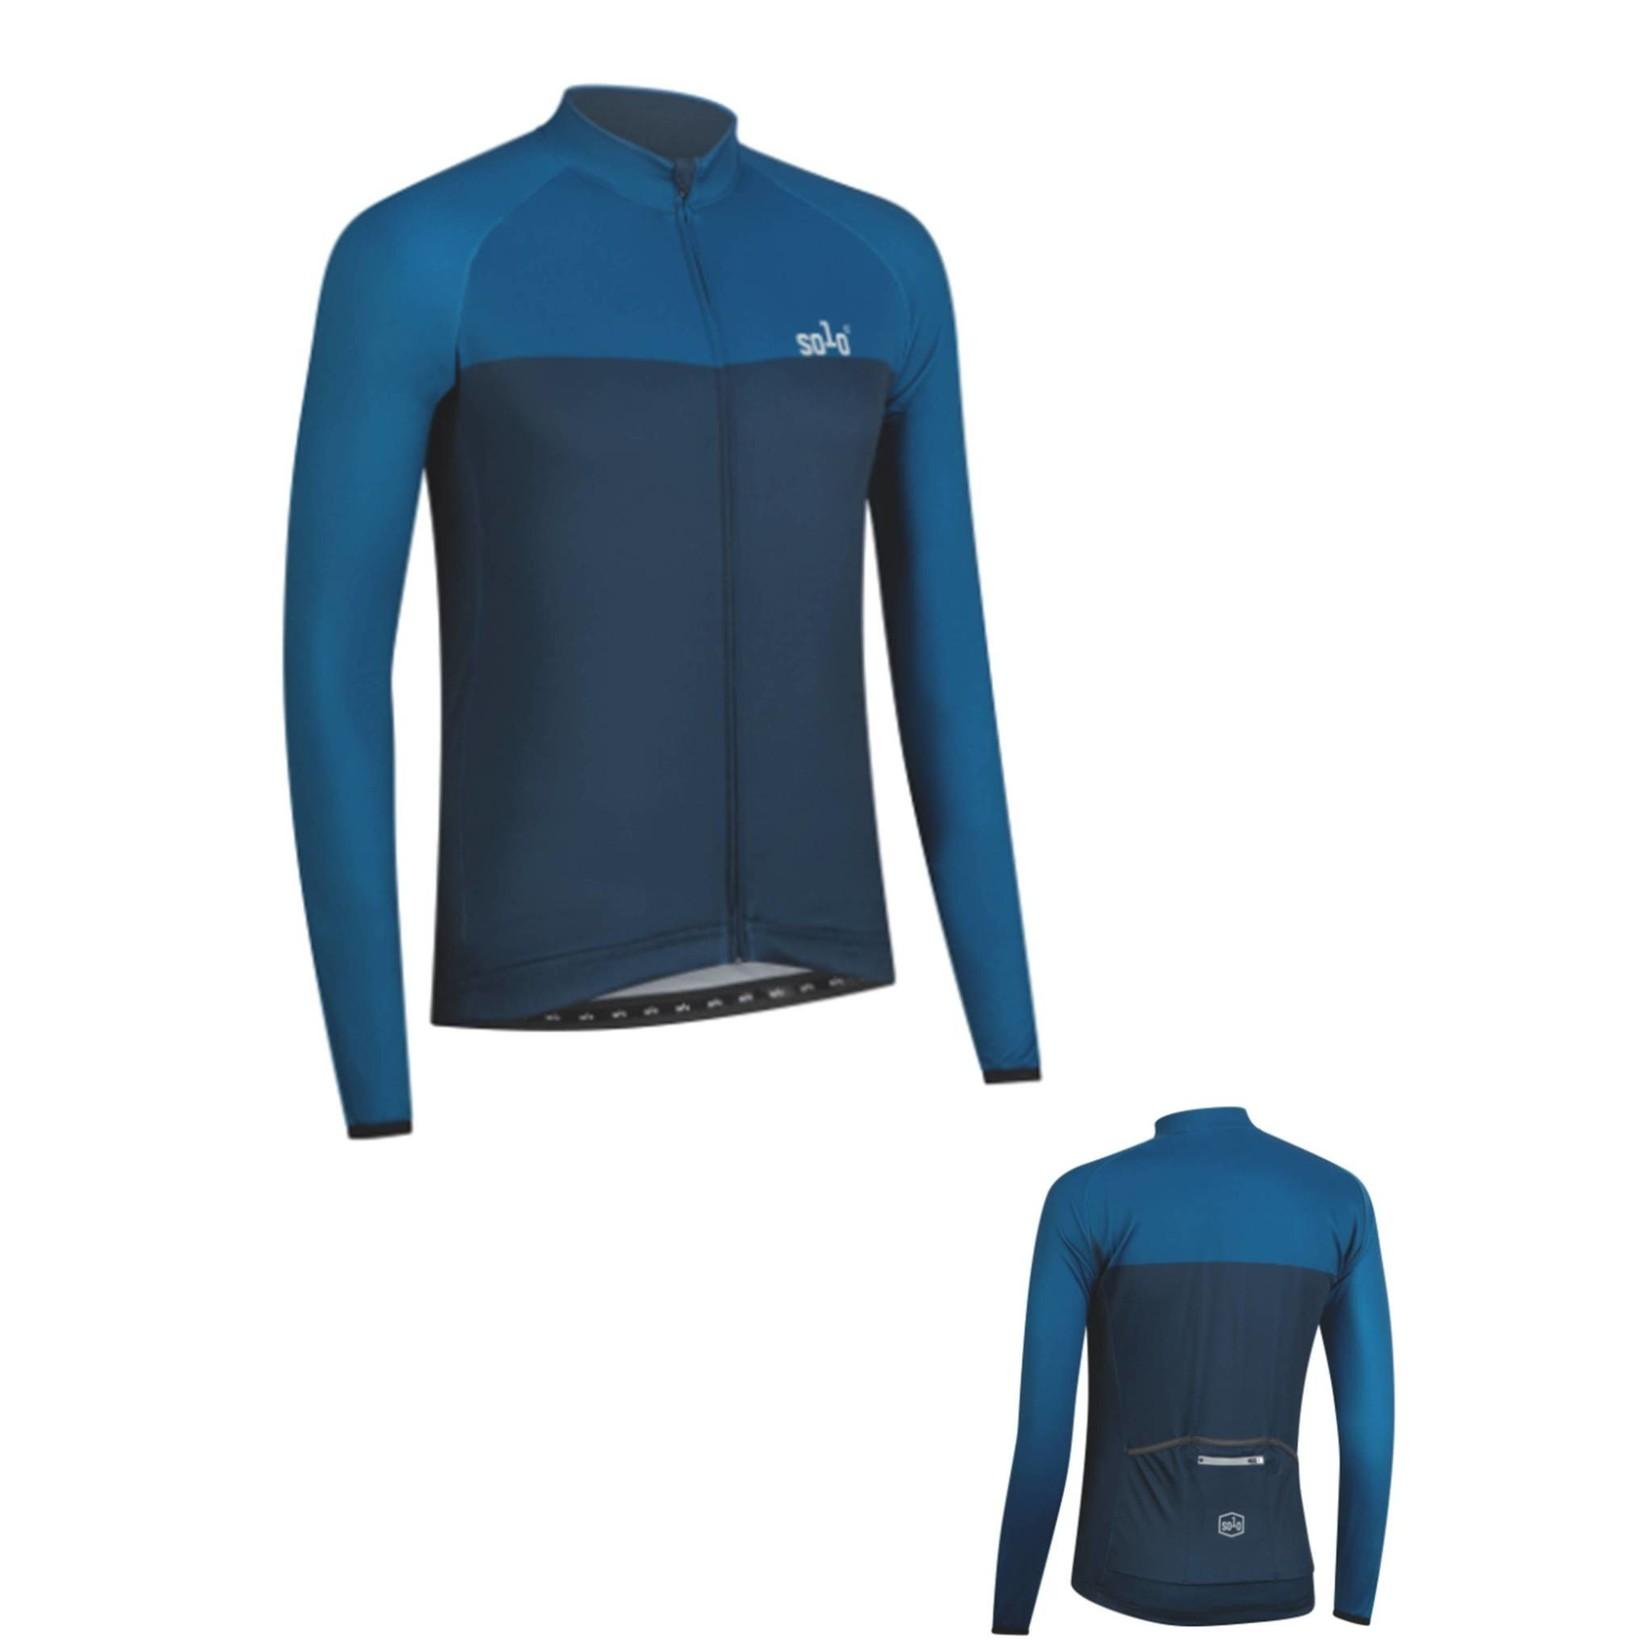 SOLO Solo 3-Season Mens Long Sleeve Jersey Blue